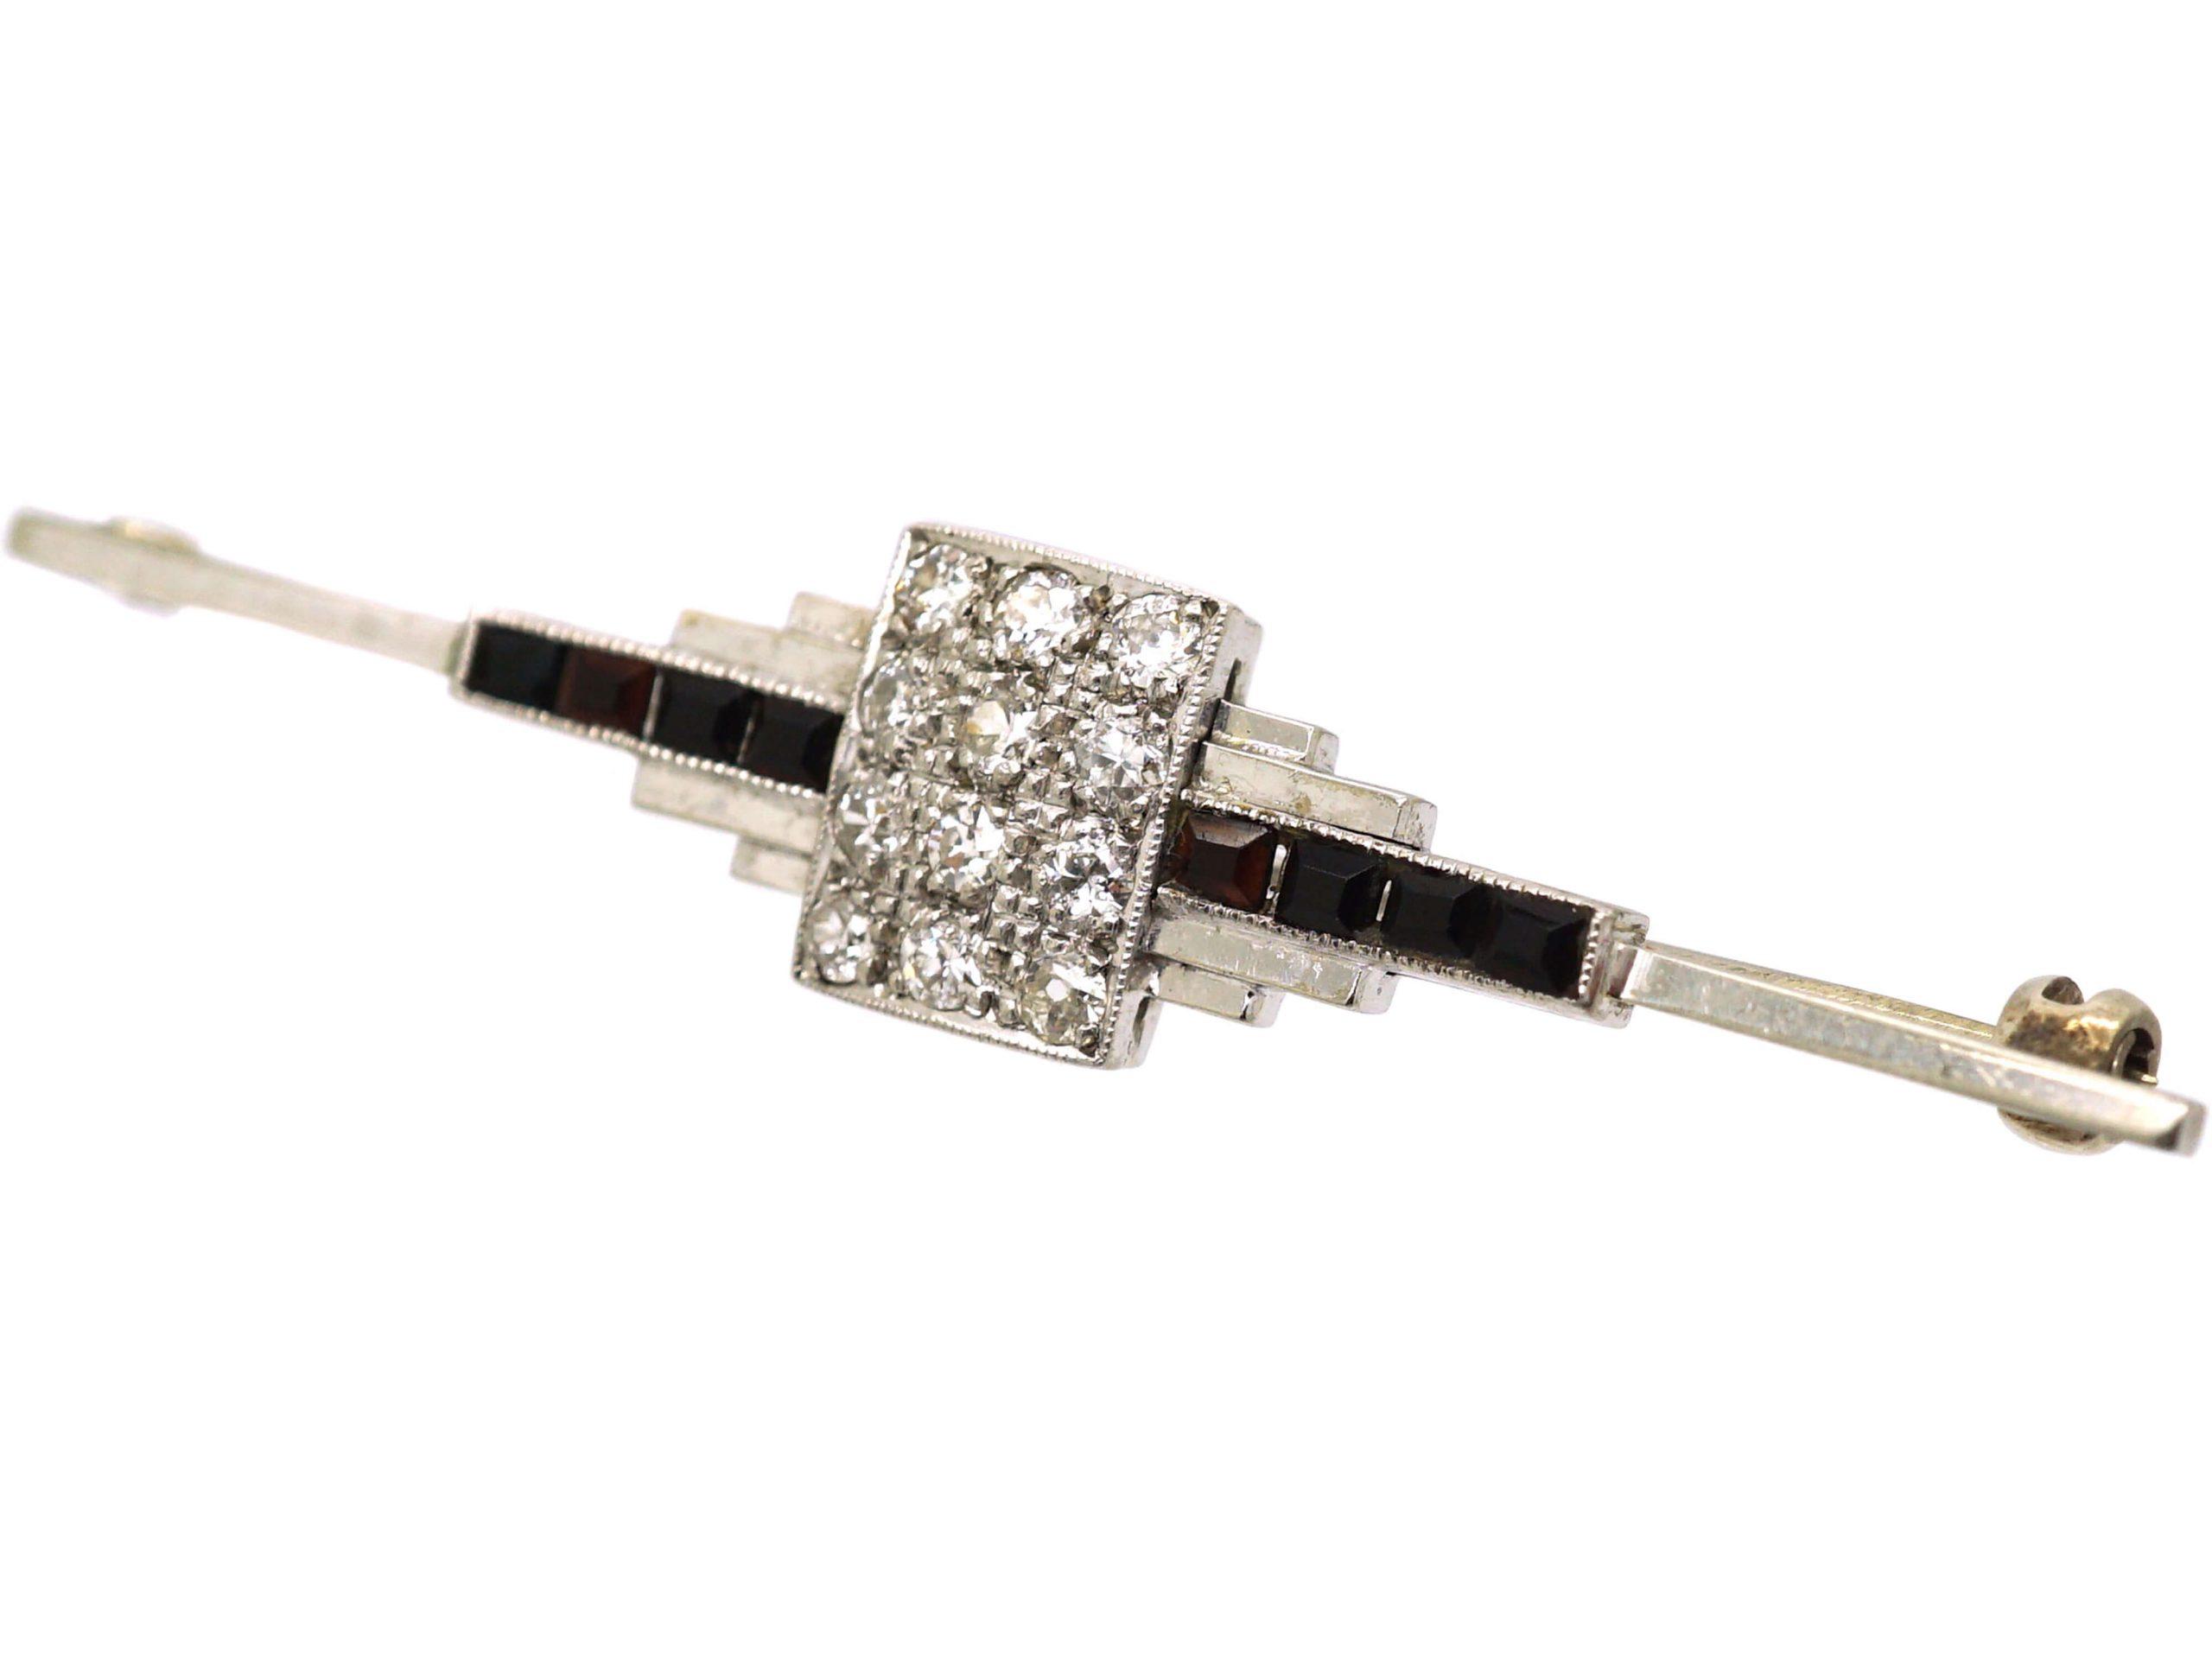 Art Deco 18ct White Gold & Platinum Geometric Brooch set with Diamonds & Onyx